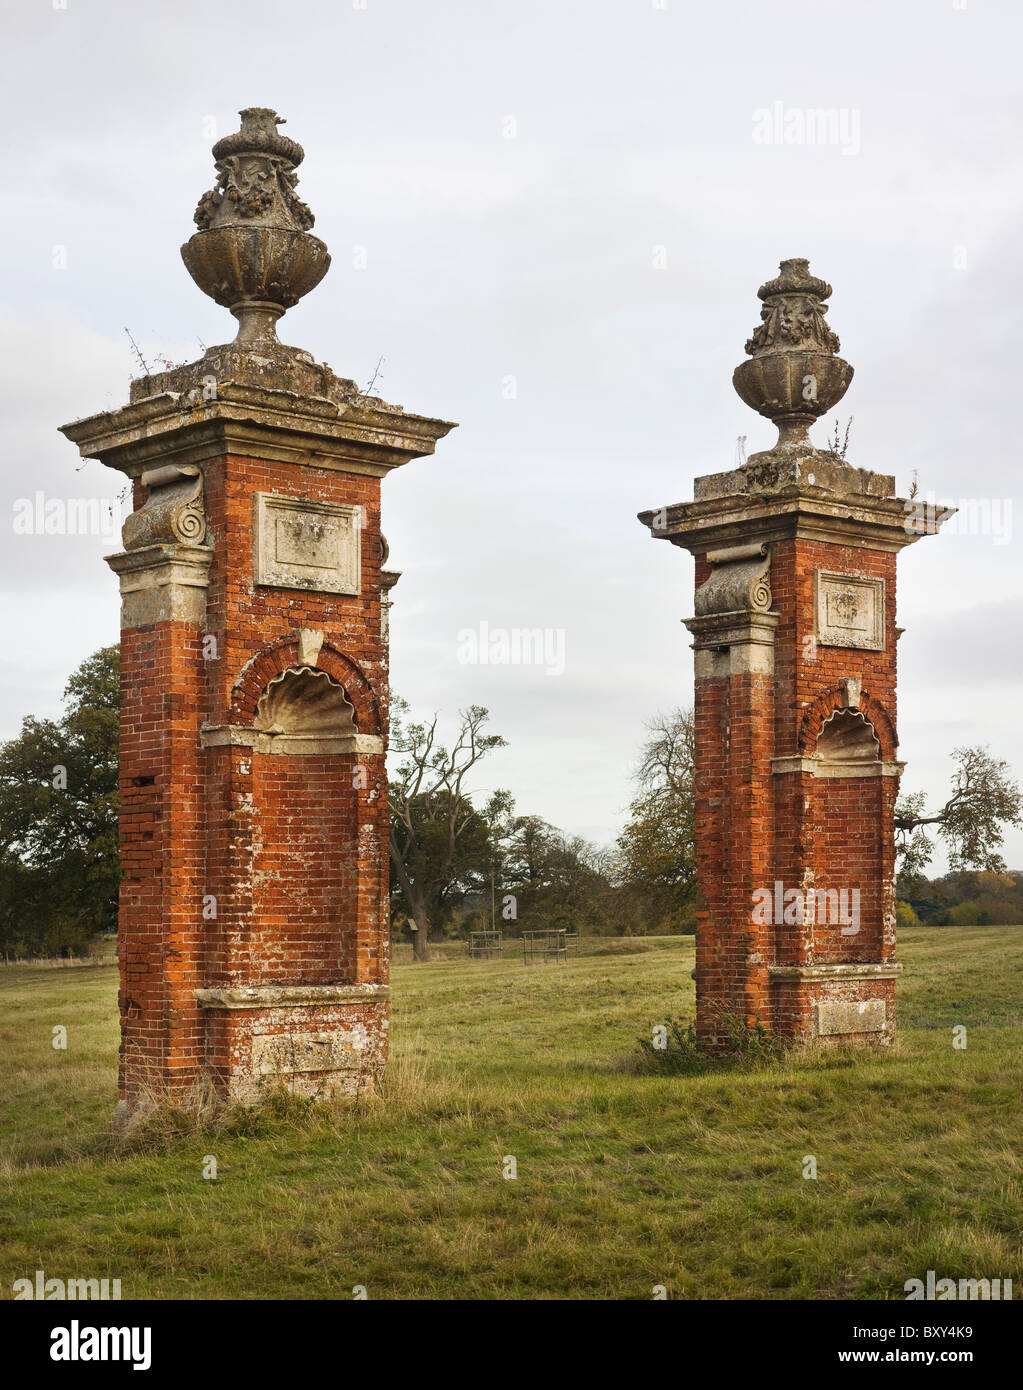 Hampstead Marshall gate piers - Stock Image